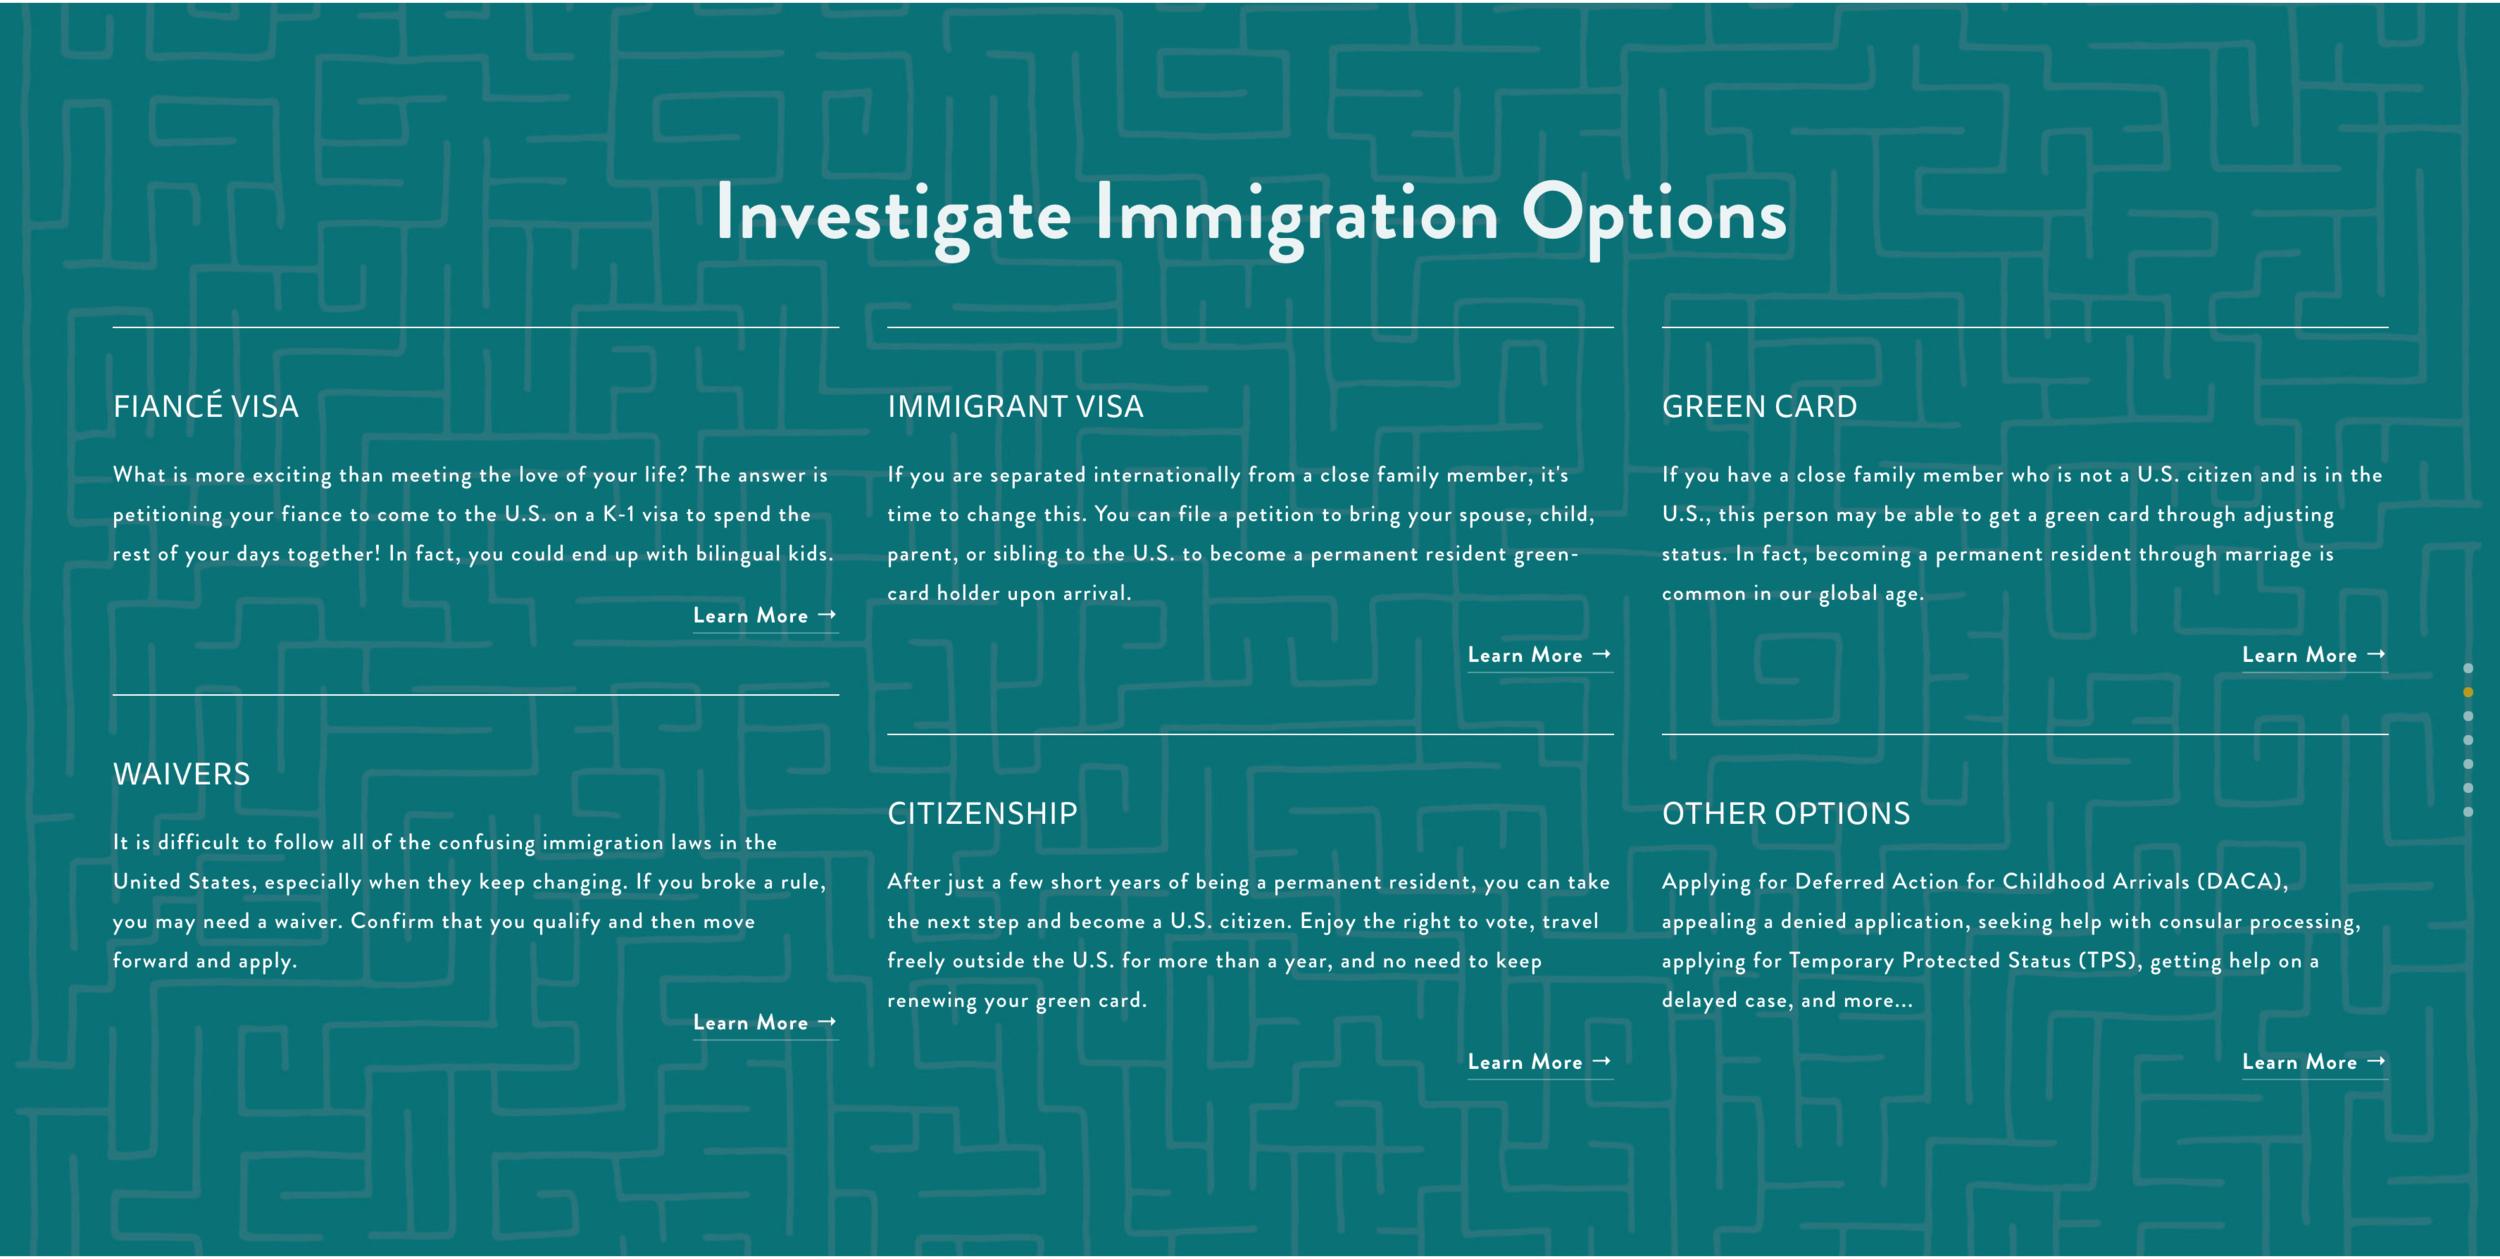 Custom Maze Graphic for Widman Immigration Law Firm - Sarah Moon + Co   sarahmoon.net